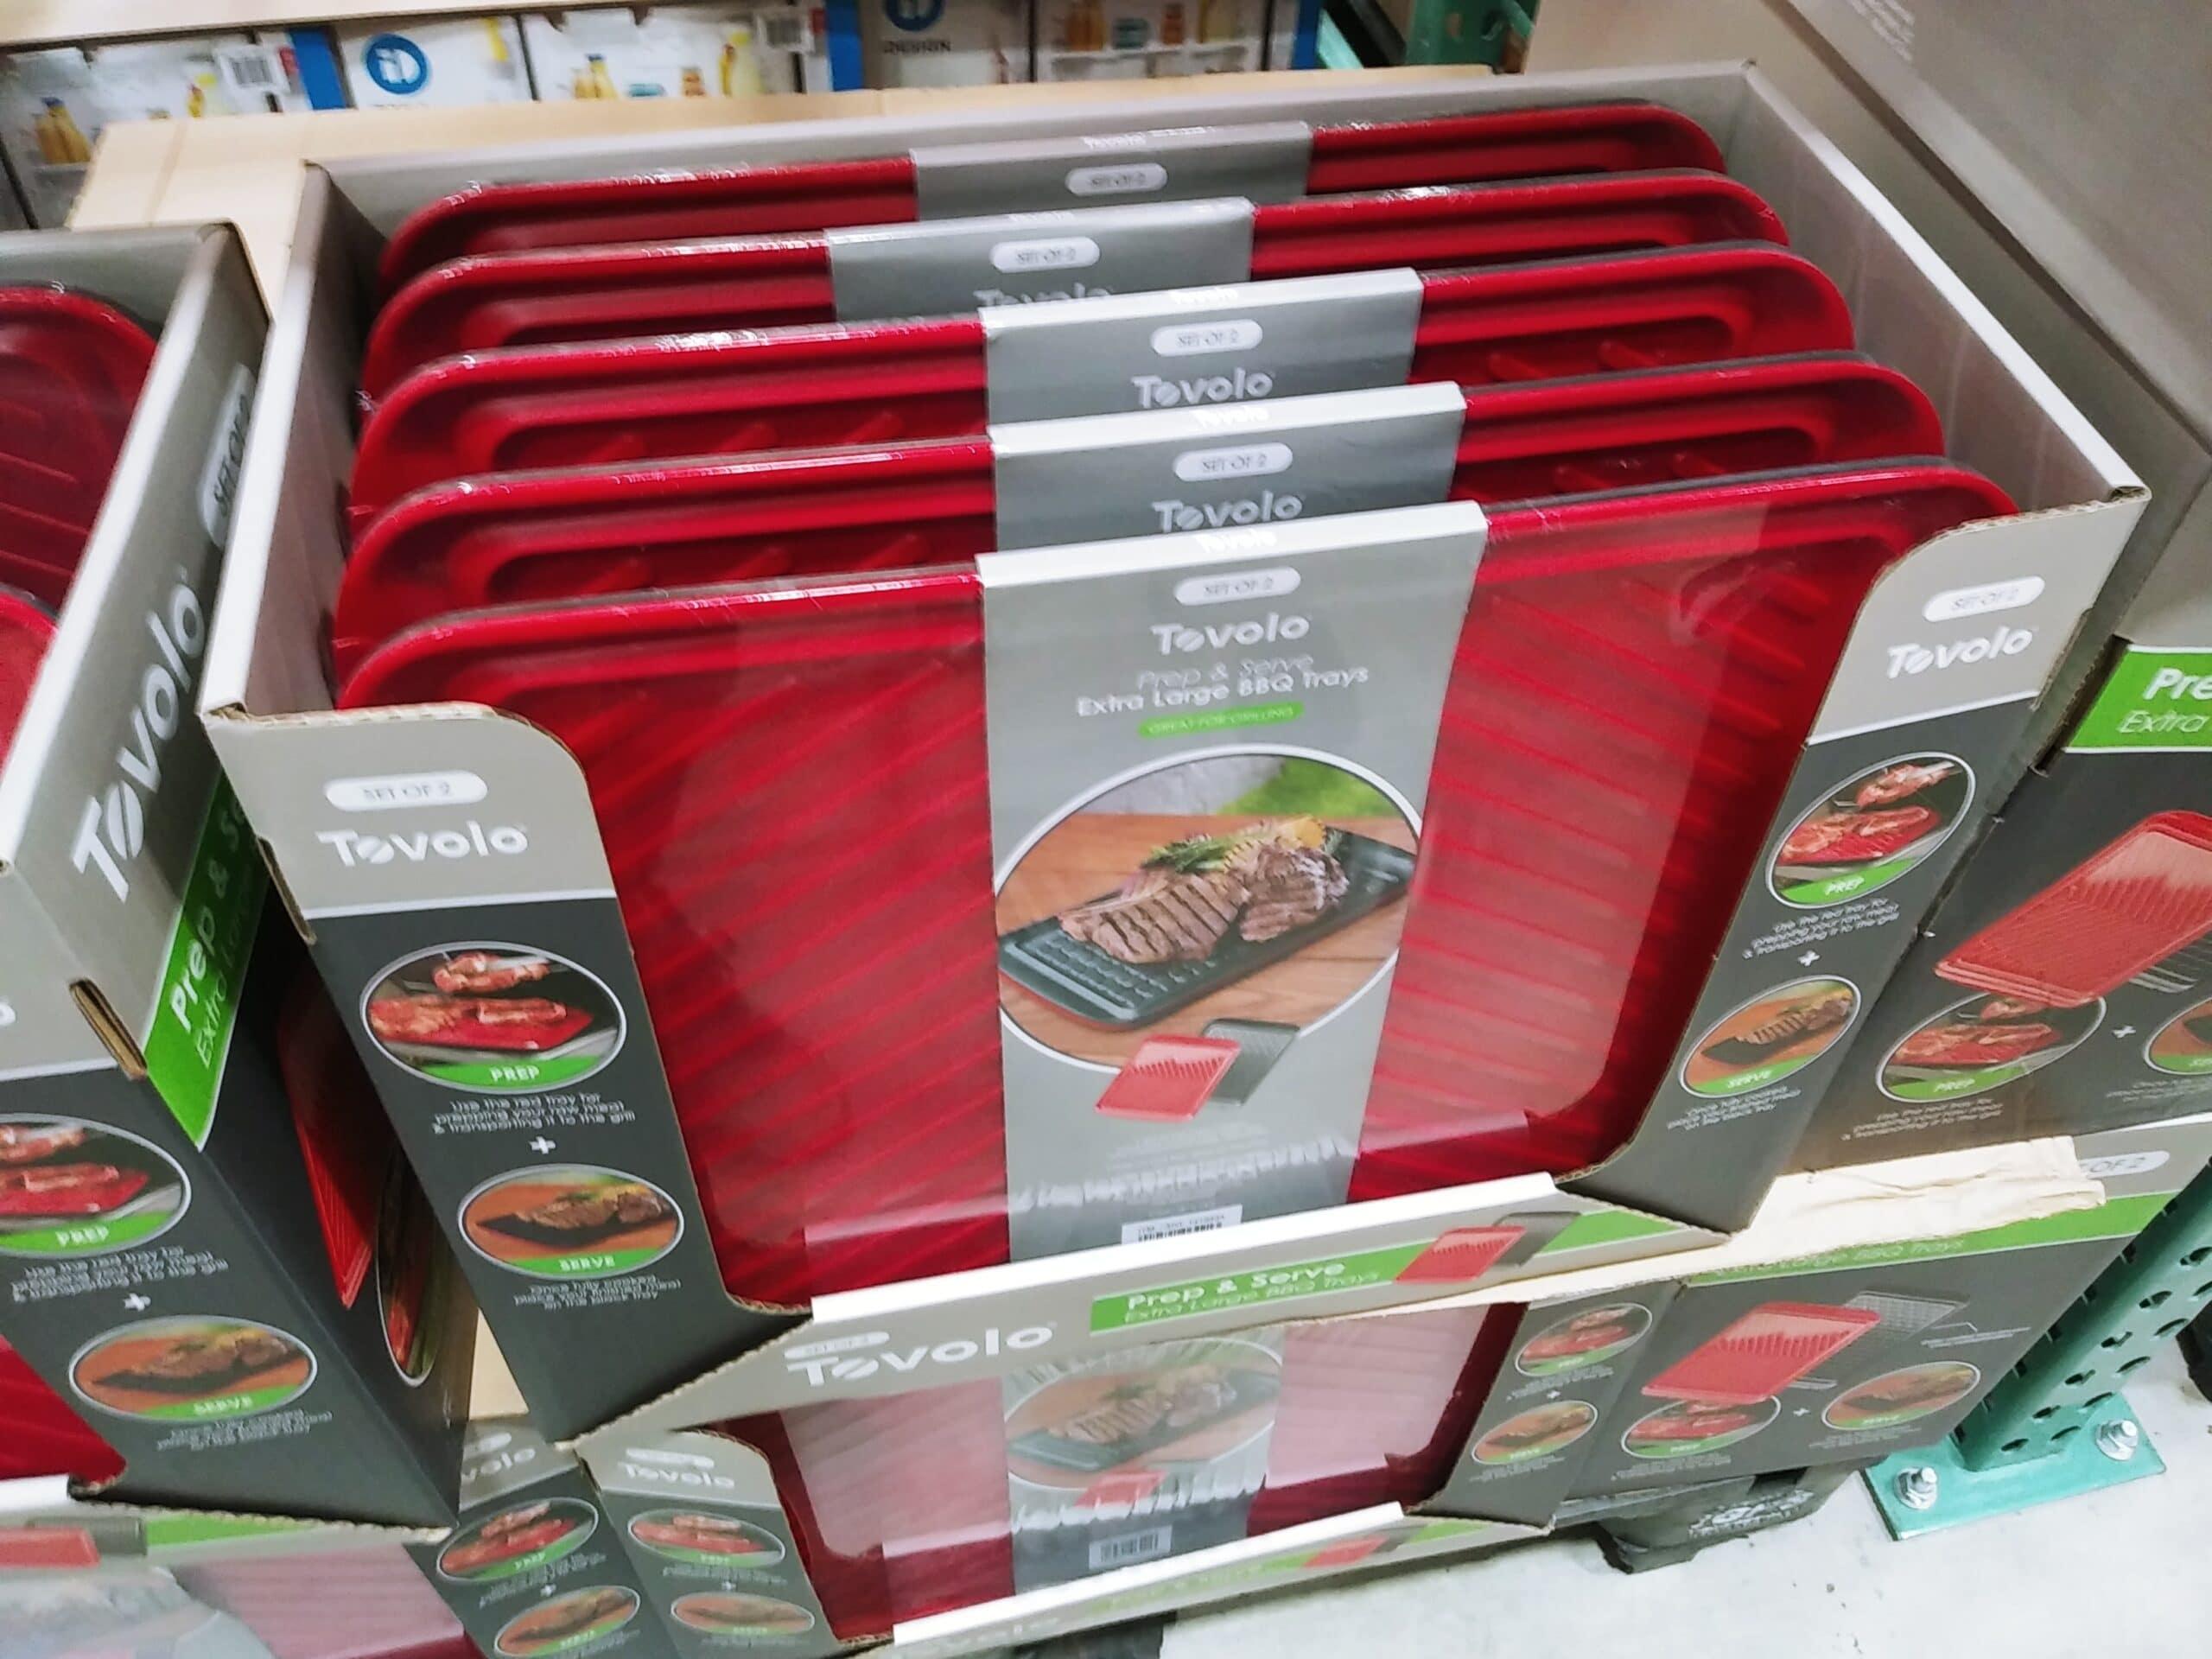 Tevolo Prep and Serve BBQ Trays $8.48 Each